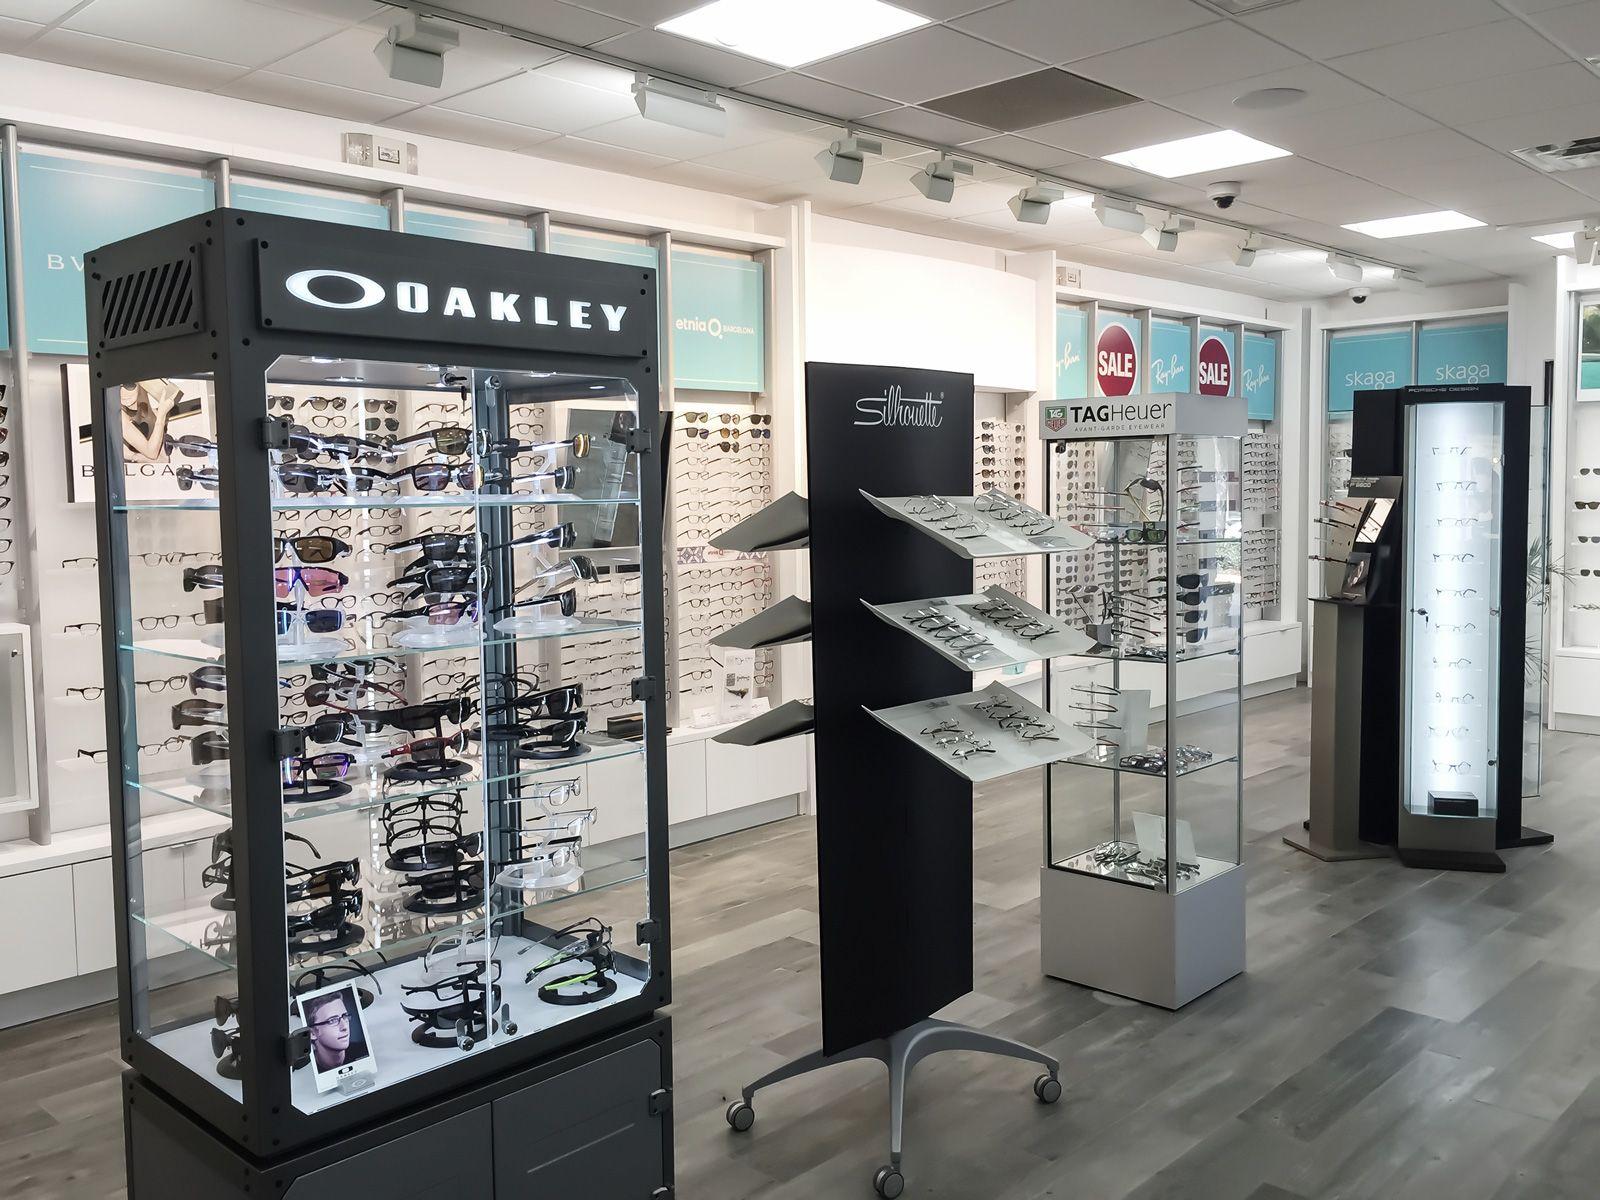 designer eyewear and sunglasses in boca raton oakley tagheuer porschedesign silhouette. Black Bedroom Furniture Sets. Home Design Ideas